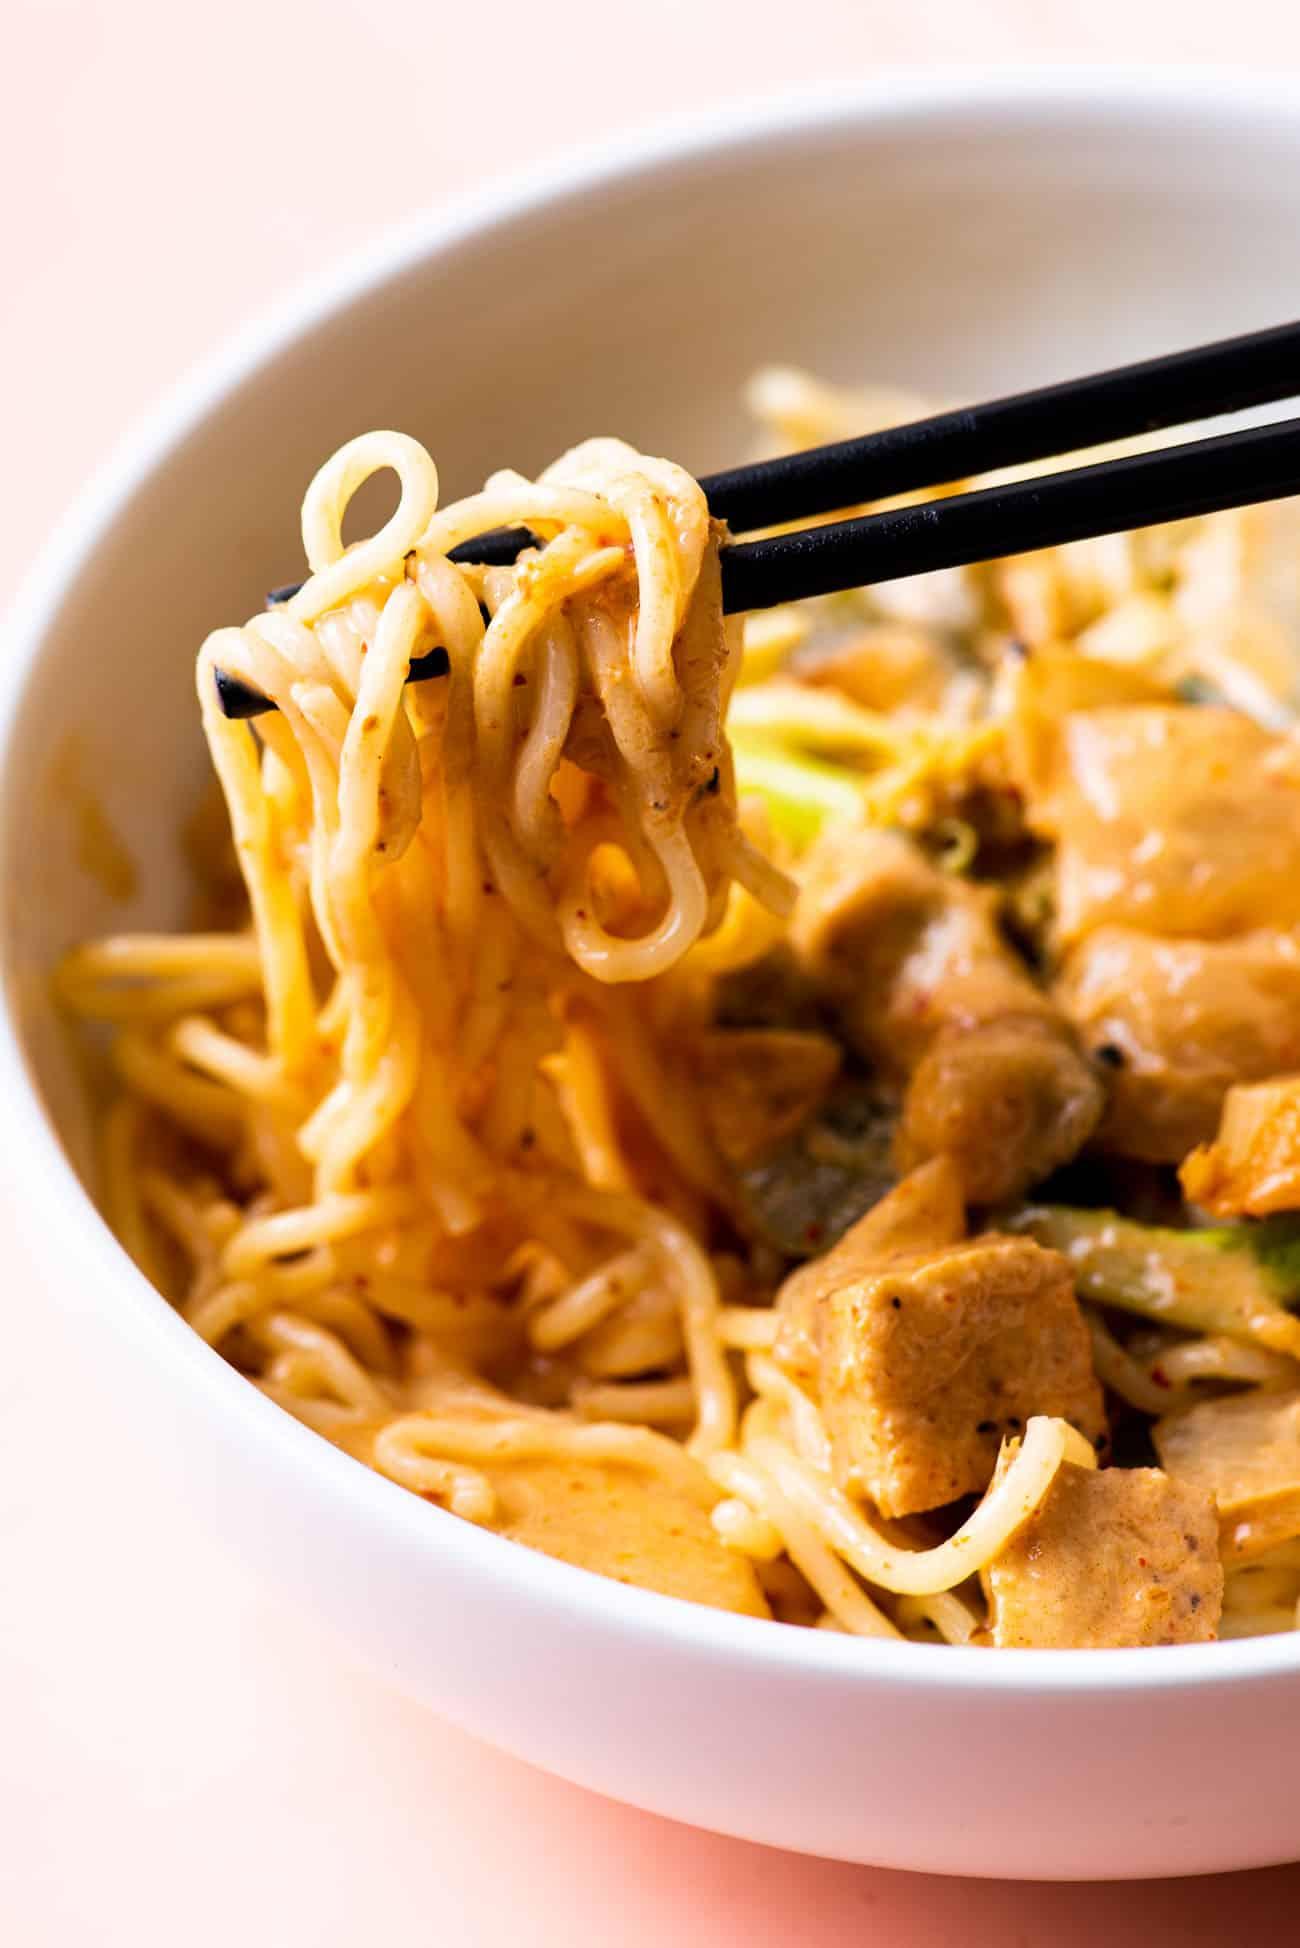 Close-up of black chopsticks holding creamy curry noodles